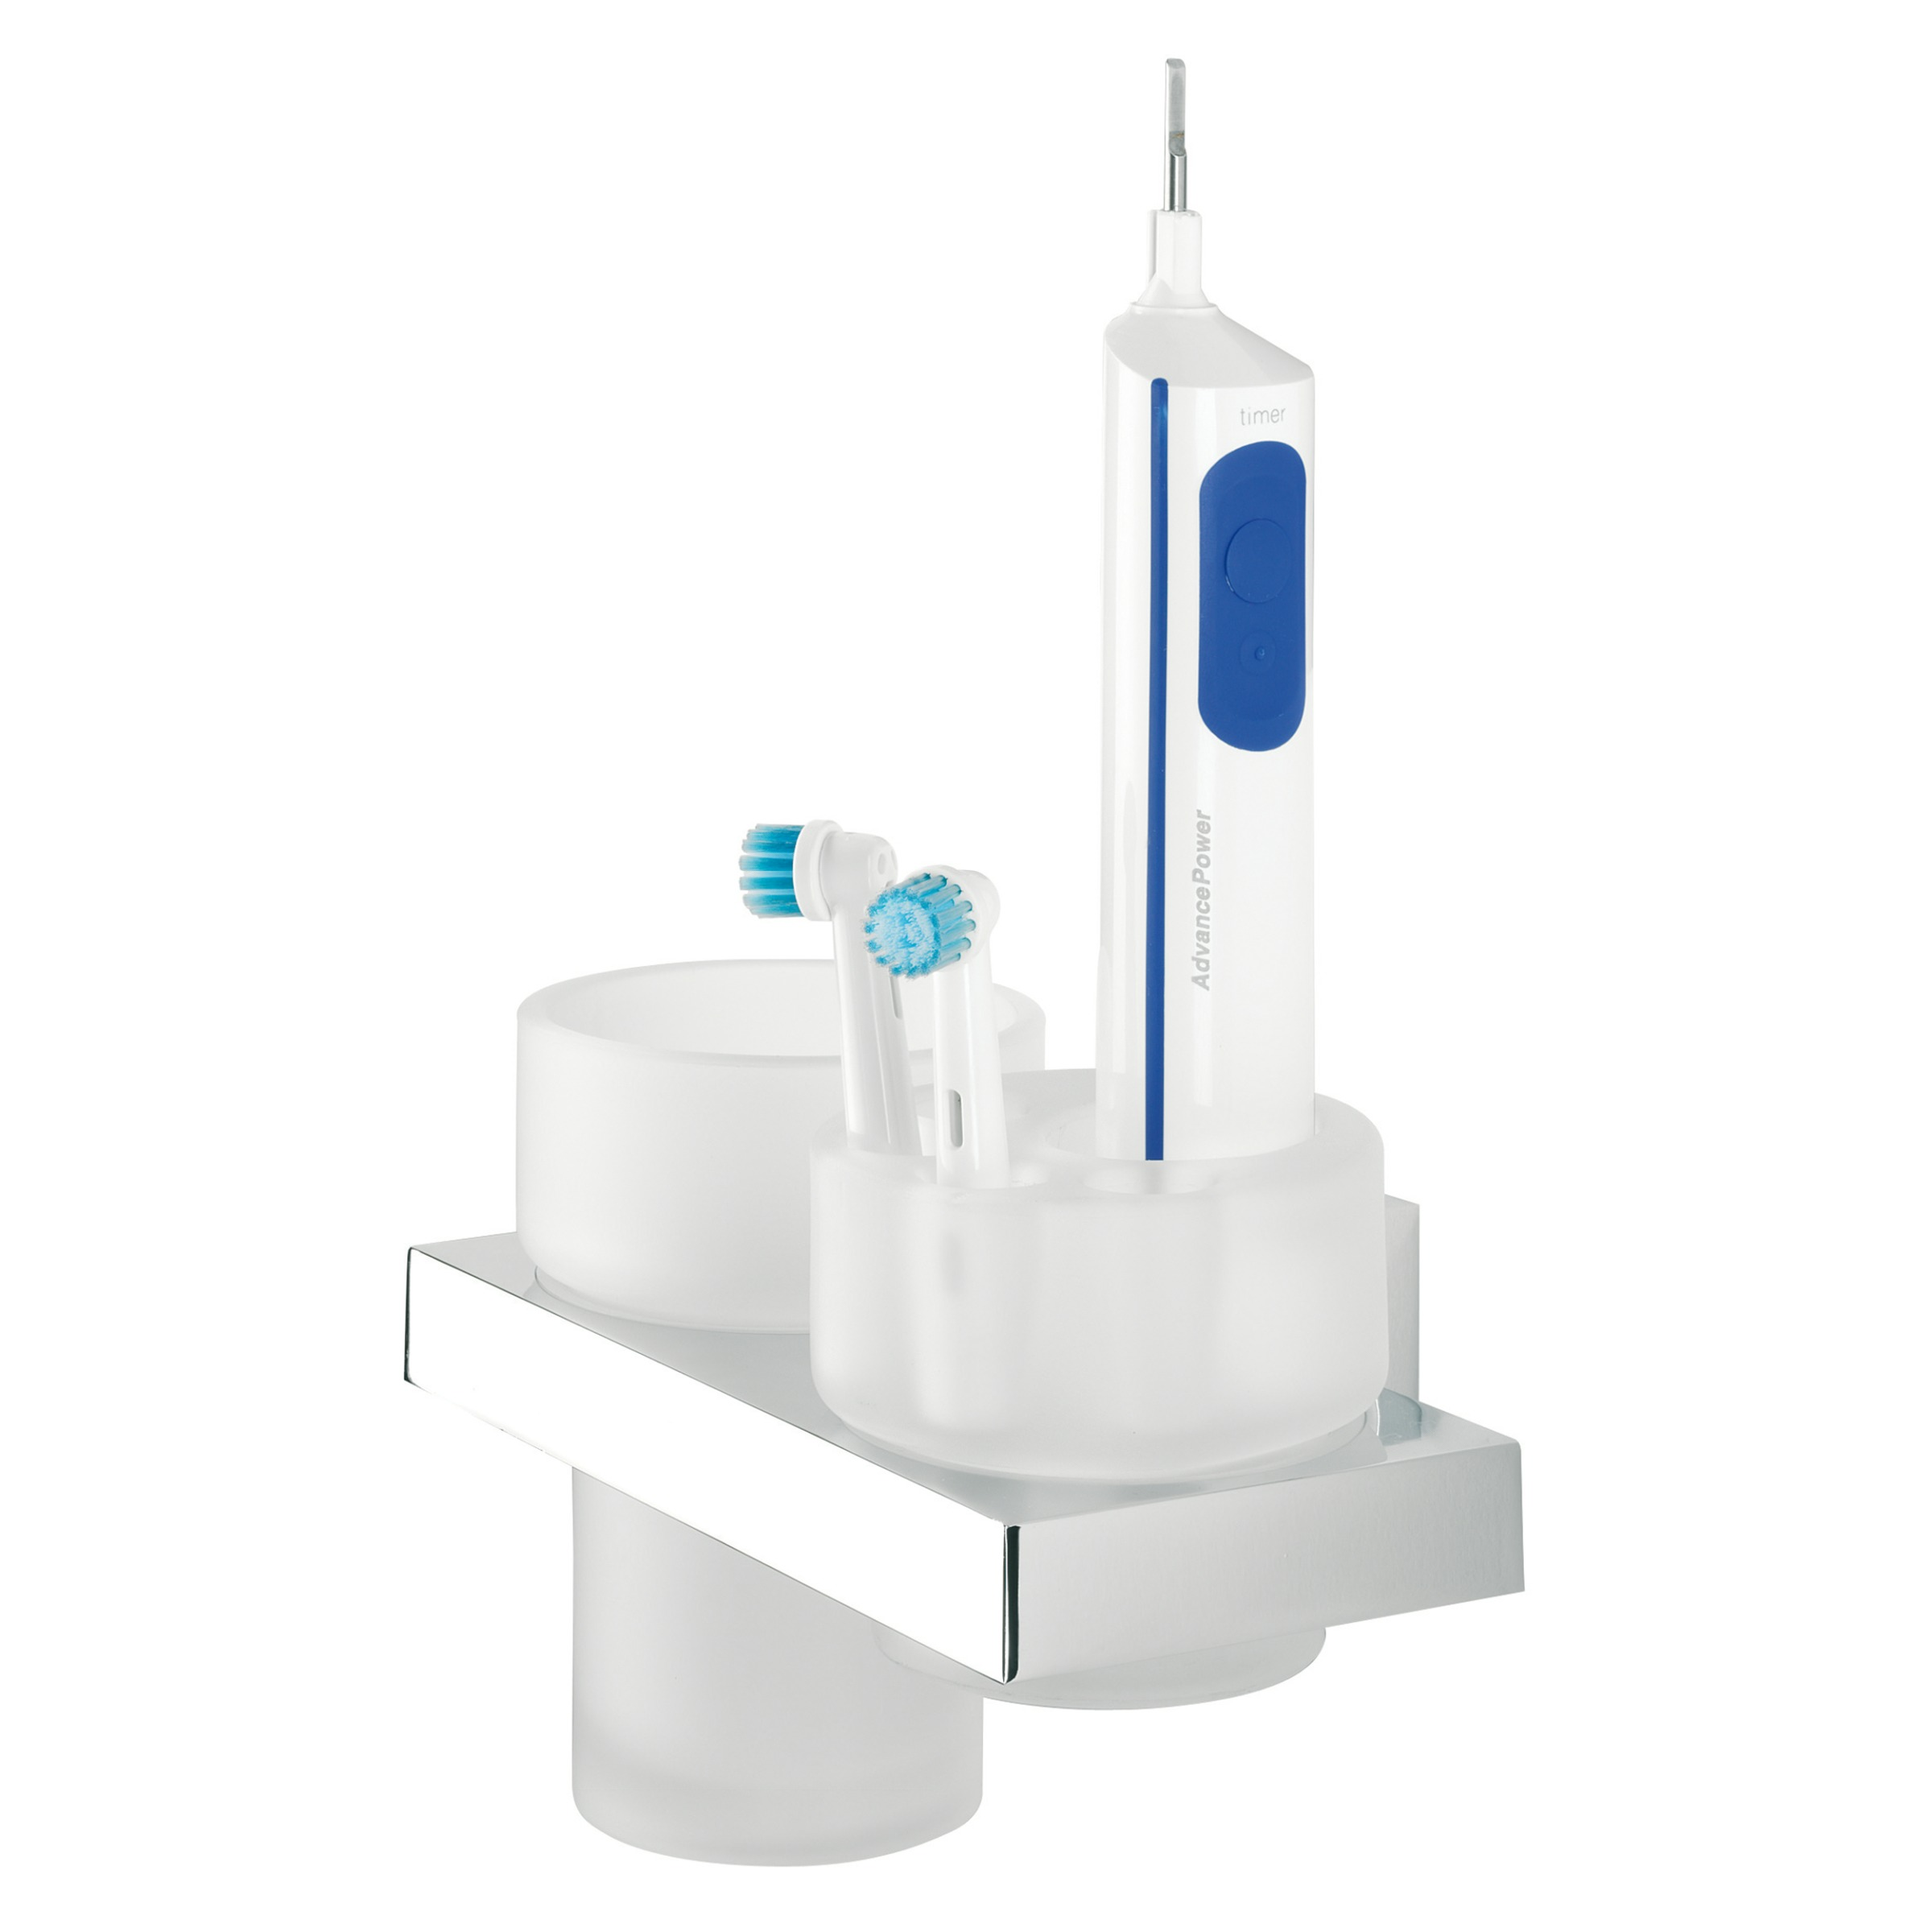 Tiger Items elektrische tandenborstelhouder, chroom